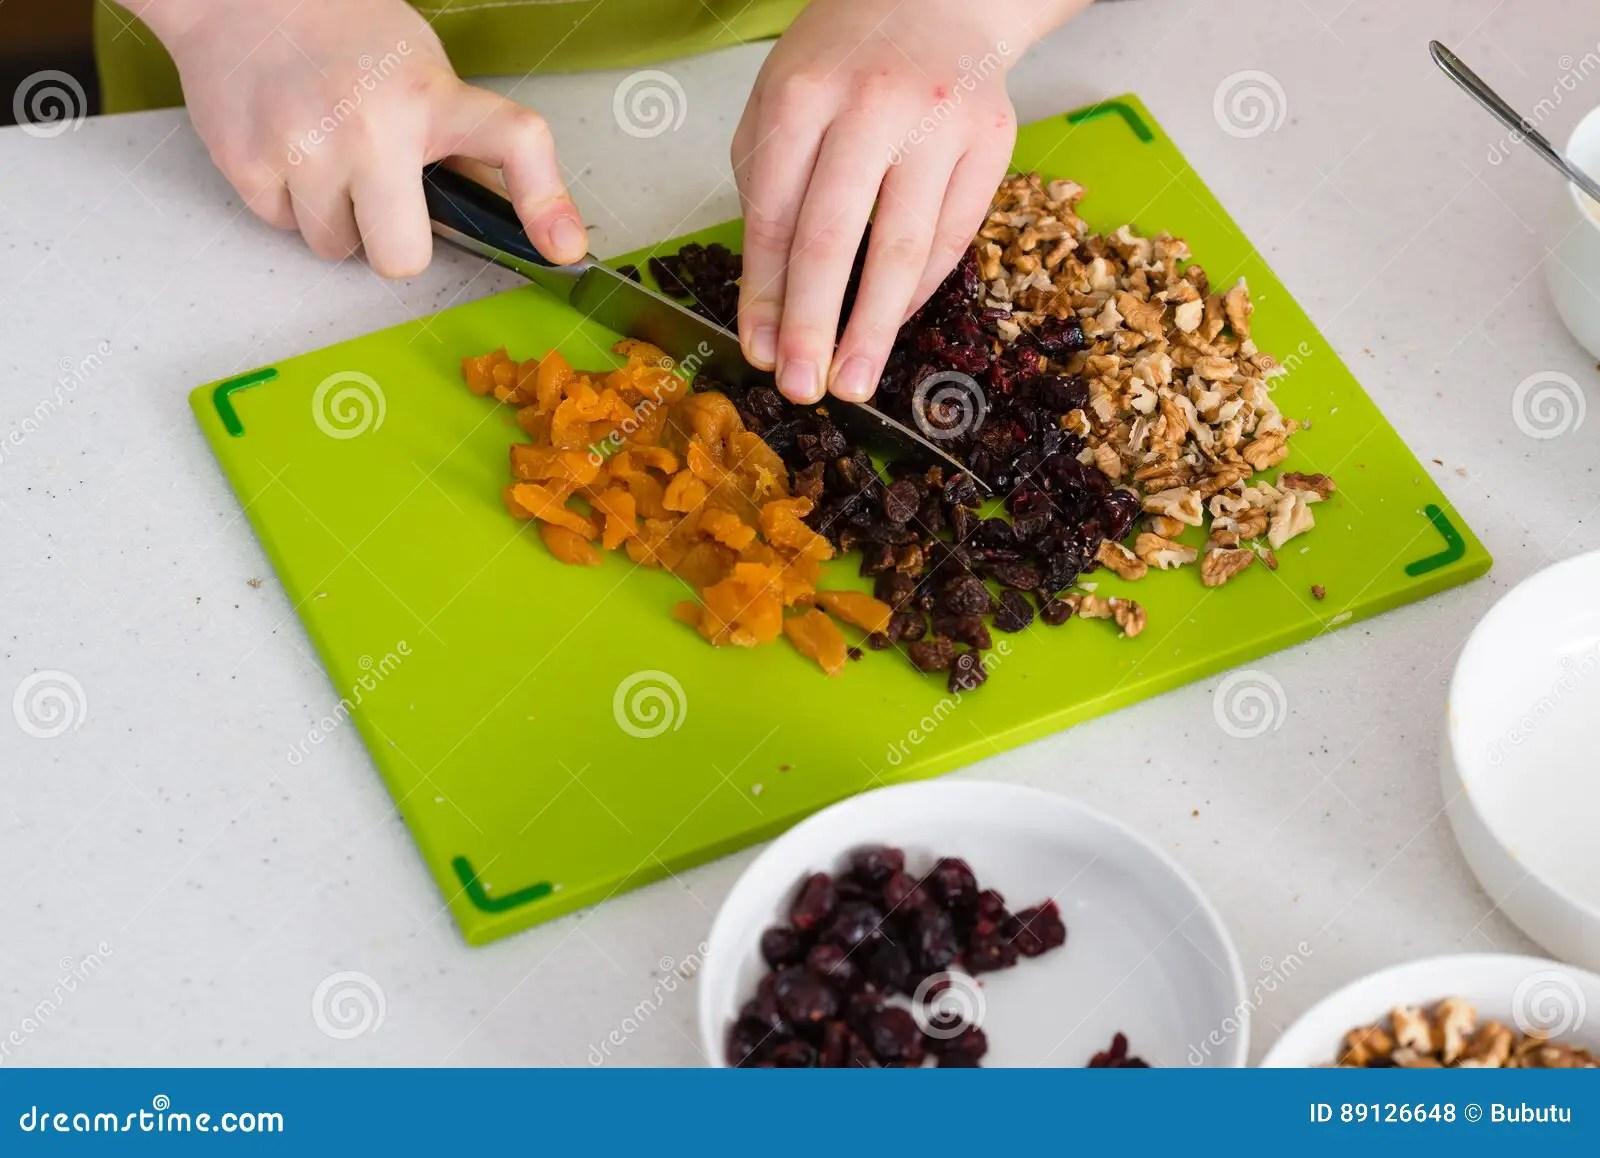 kitchen reno design services online 在家准备格兰诺拉麦片在厨房里库存照片 图片包括有滑稽 了解 果子 格 在家准备在厨房 健康吃概念的格兰诺拉麦片